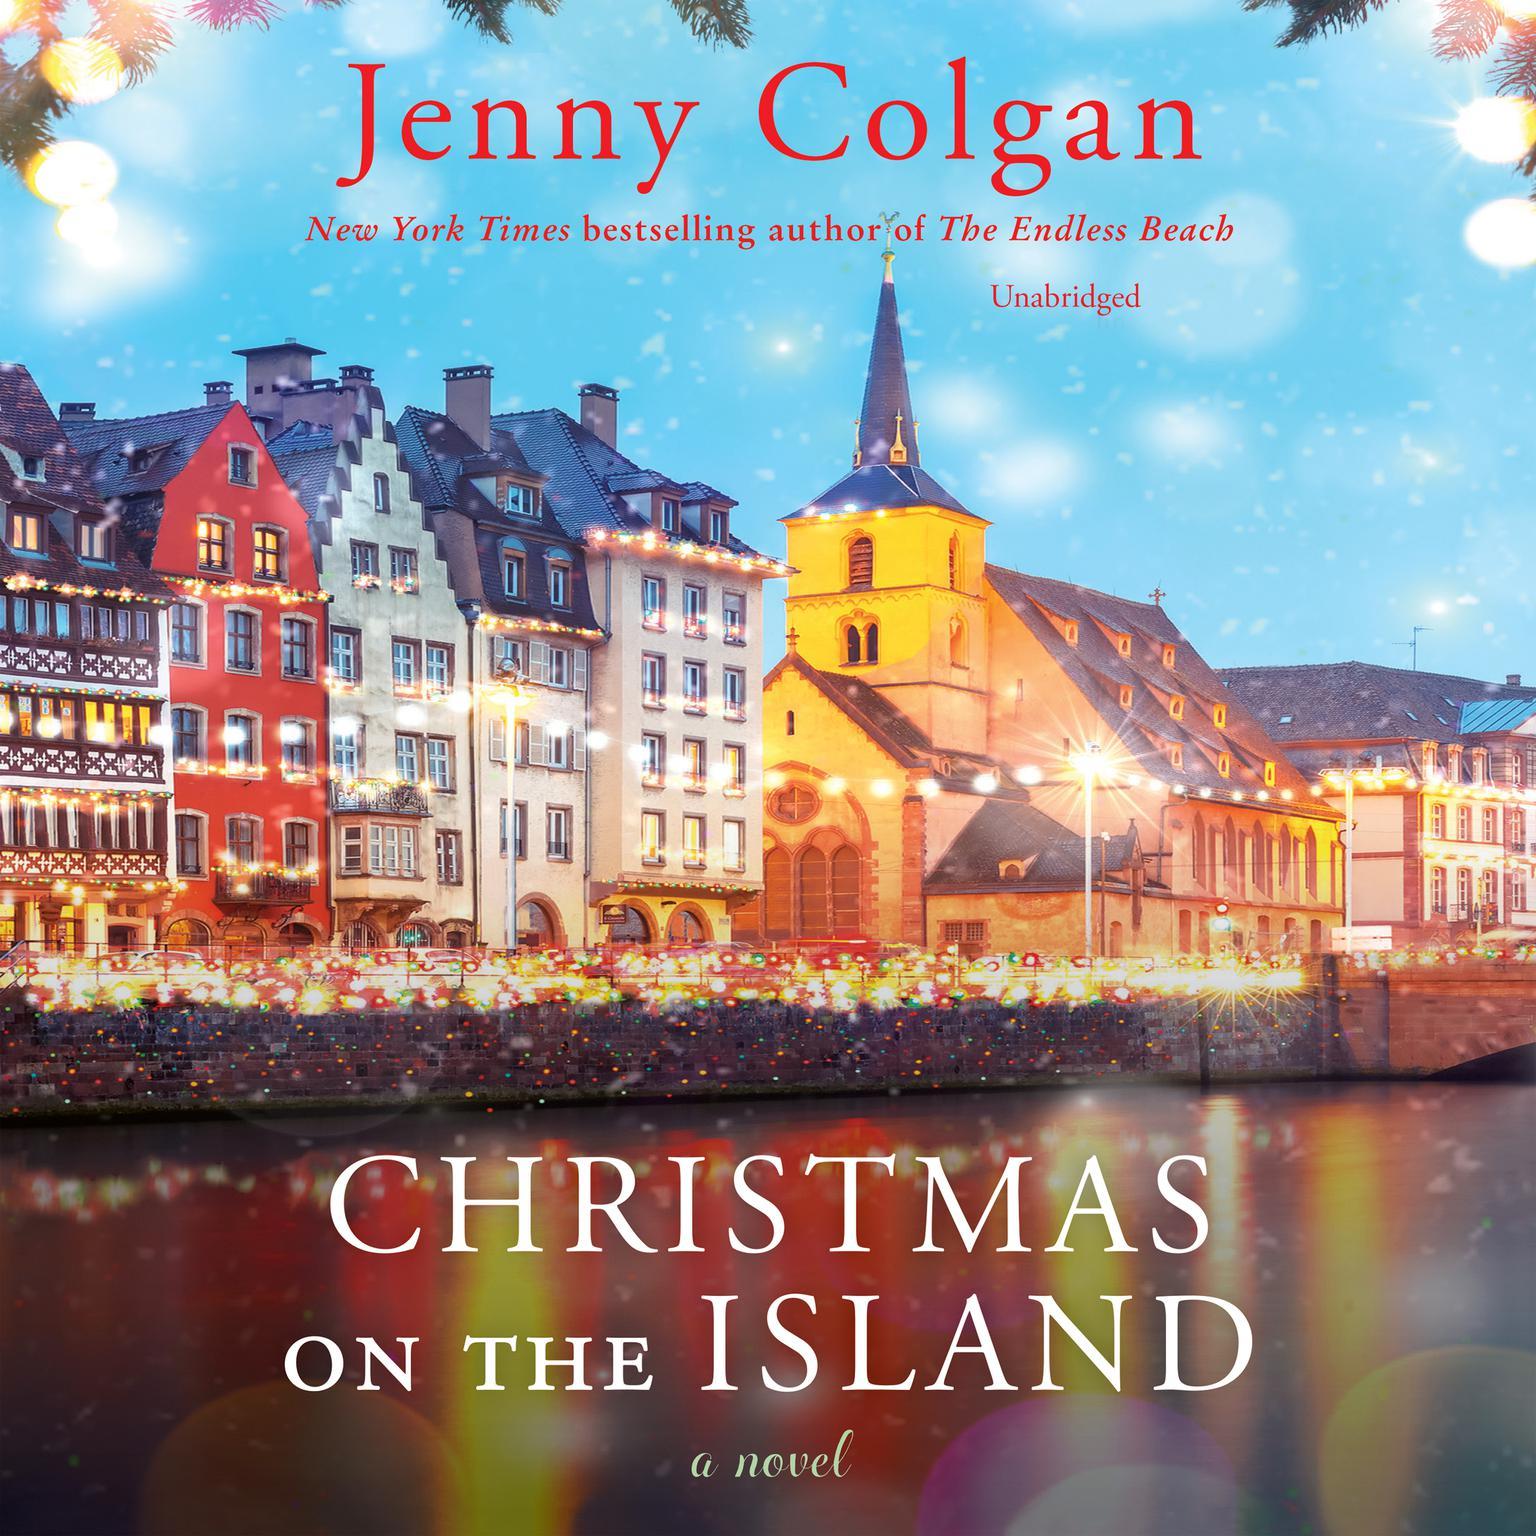 Printable Christmas on the Island: A Novel Audiobook Cover Art